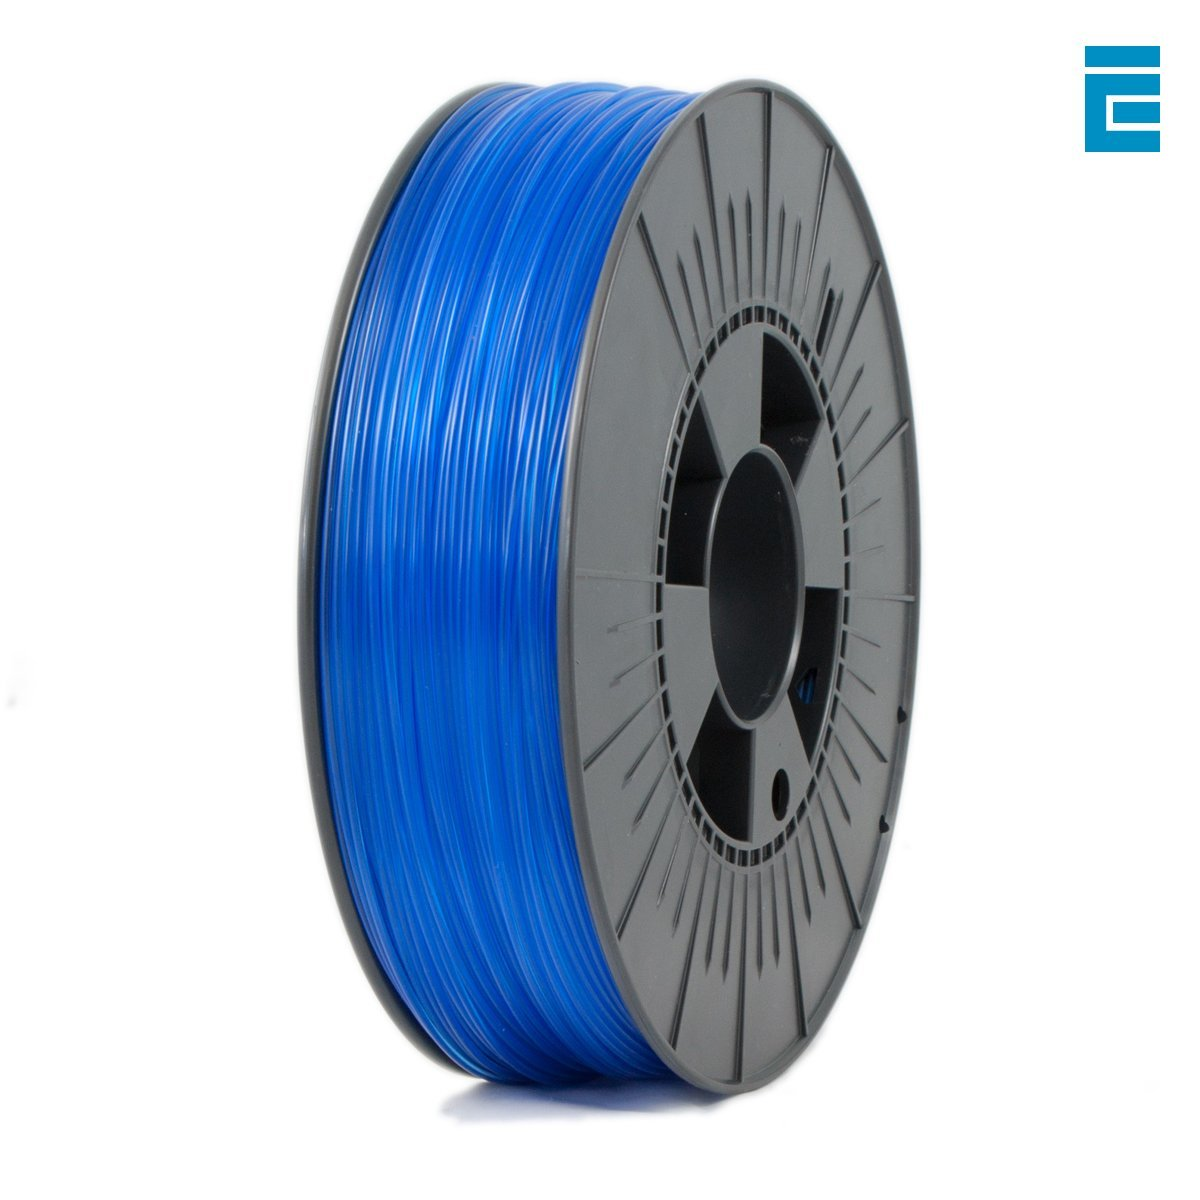 Ice Filaments ICEFIL1PET151 Filamento PET 1.75mm, 0.75kg, Blu Claro Dutch Filaments